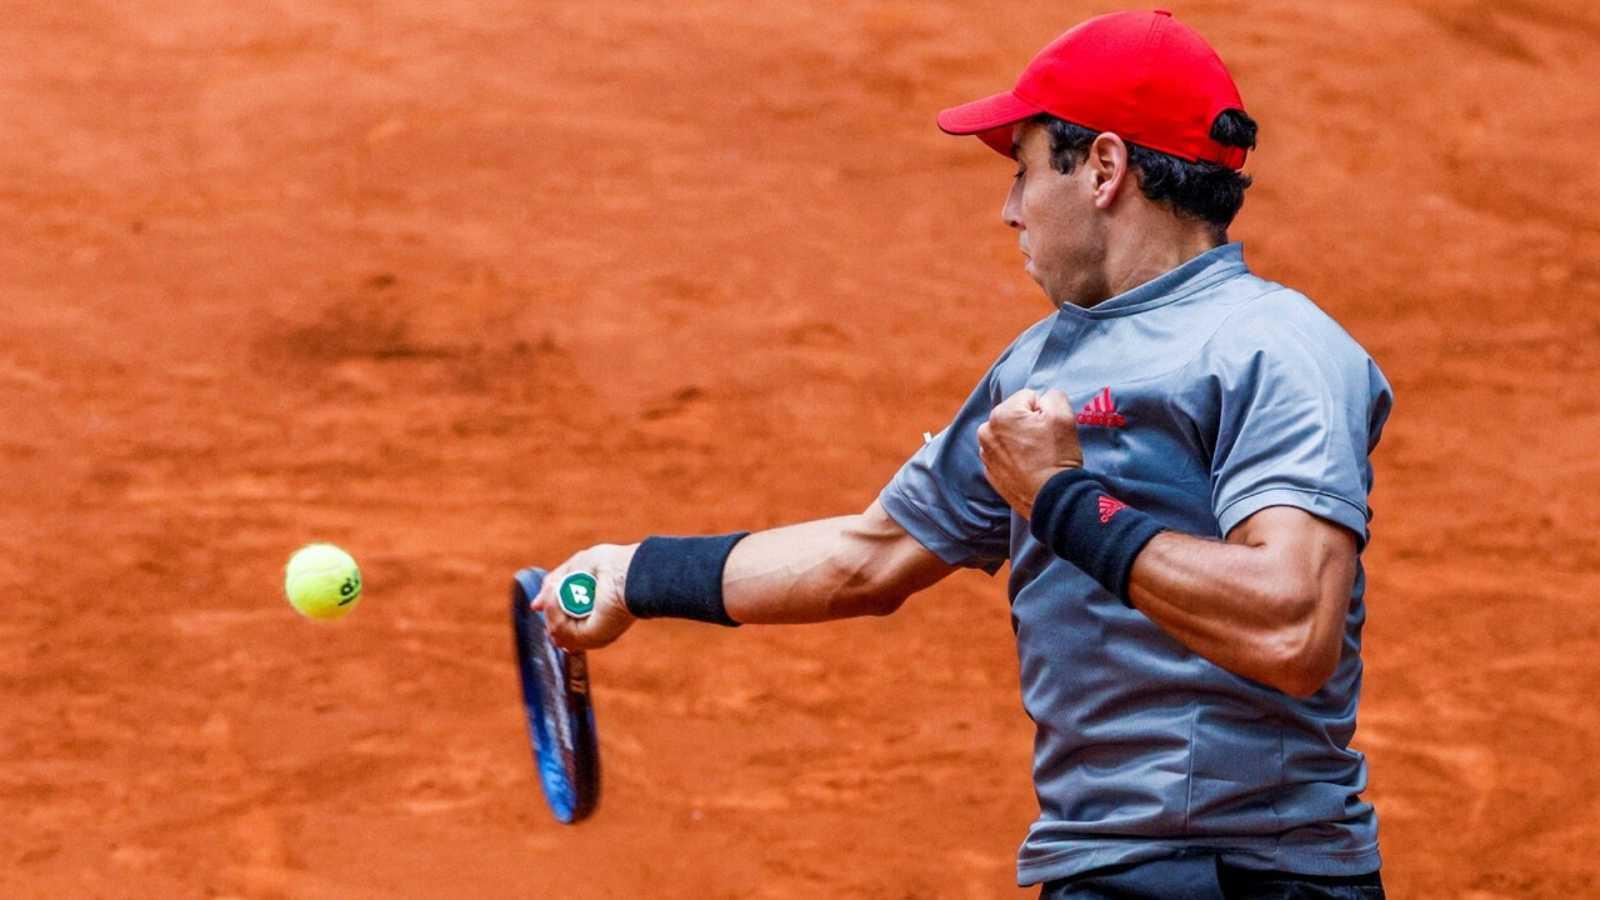 Tenis - ATP Mutua Madrid Open: Álex de Miñaur - Jaume Munar - ver ahora